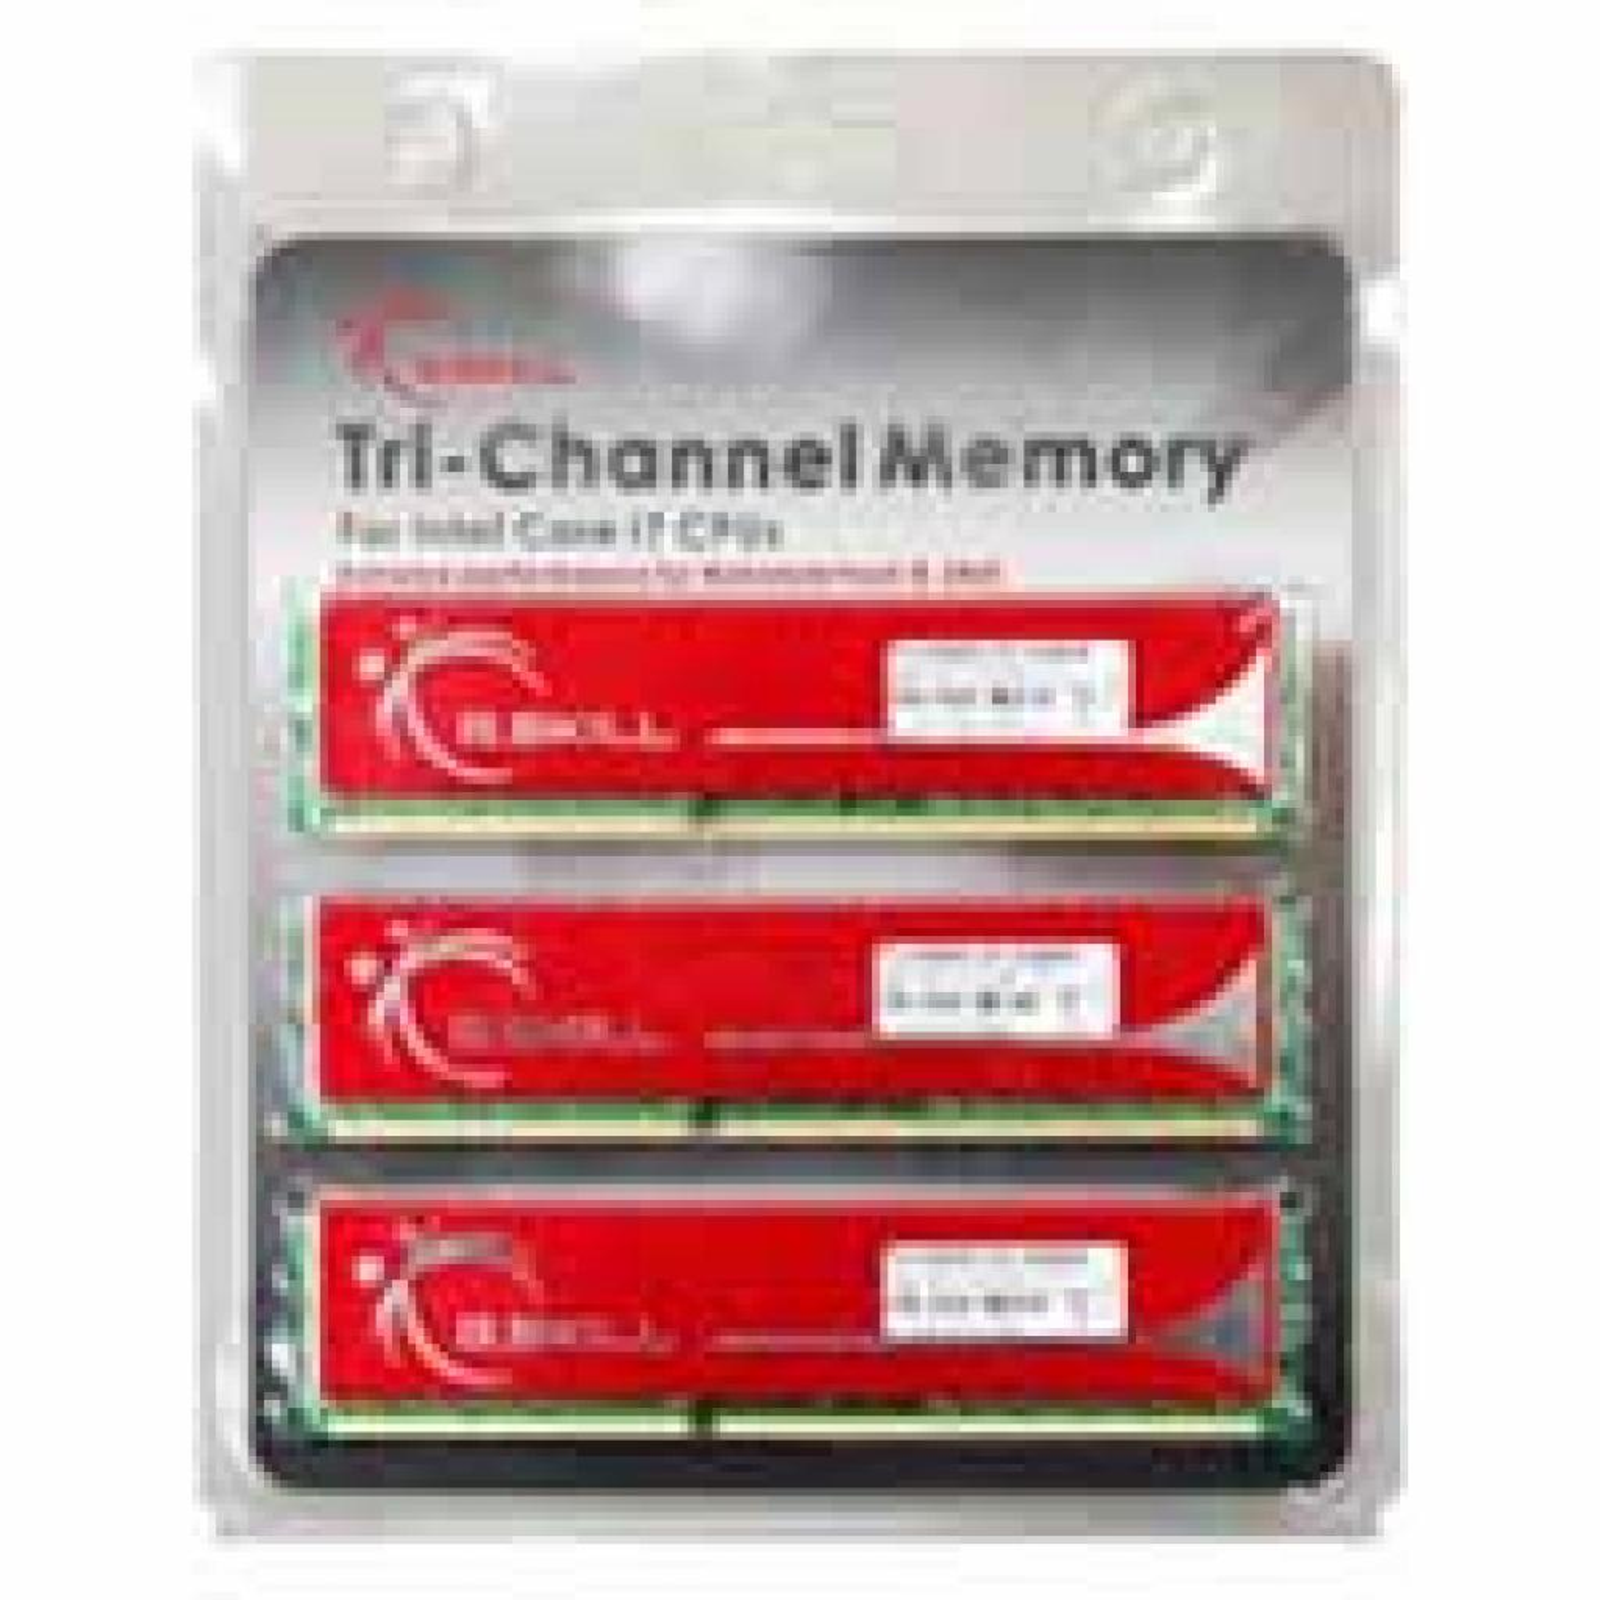 Модуль памяти для компьютера DDR3 6GB (3x2GB) 1600 MHz G.Skill (F3-12800CL9T-6GBNQ)